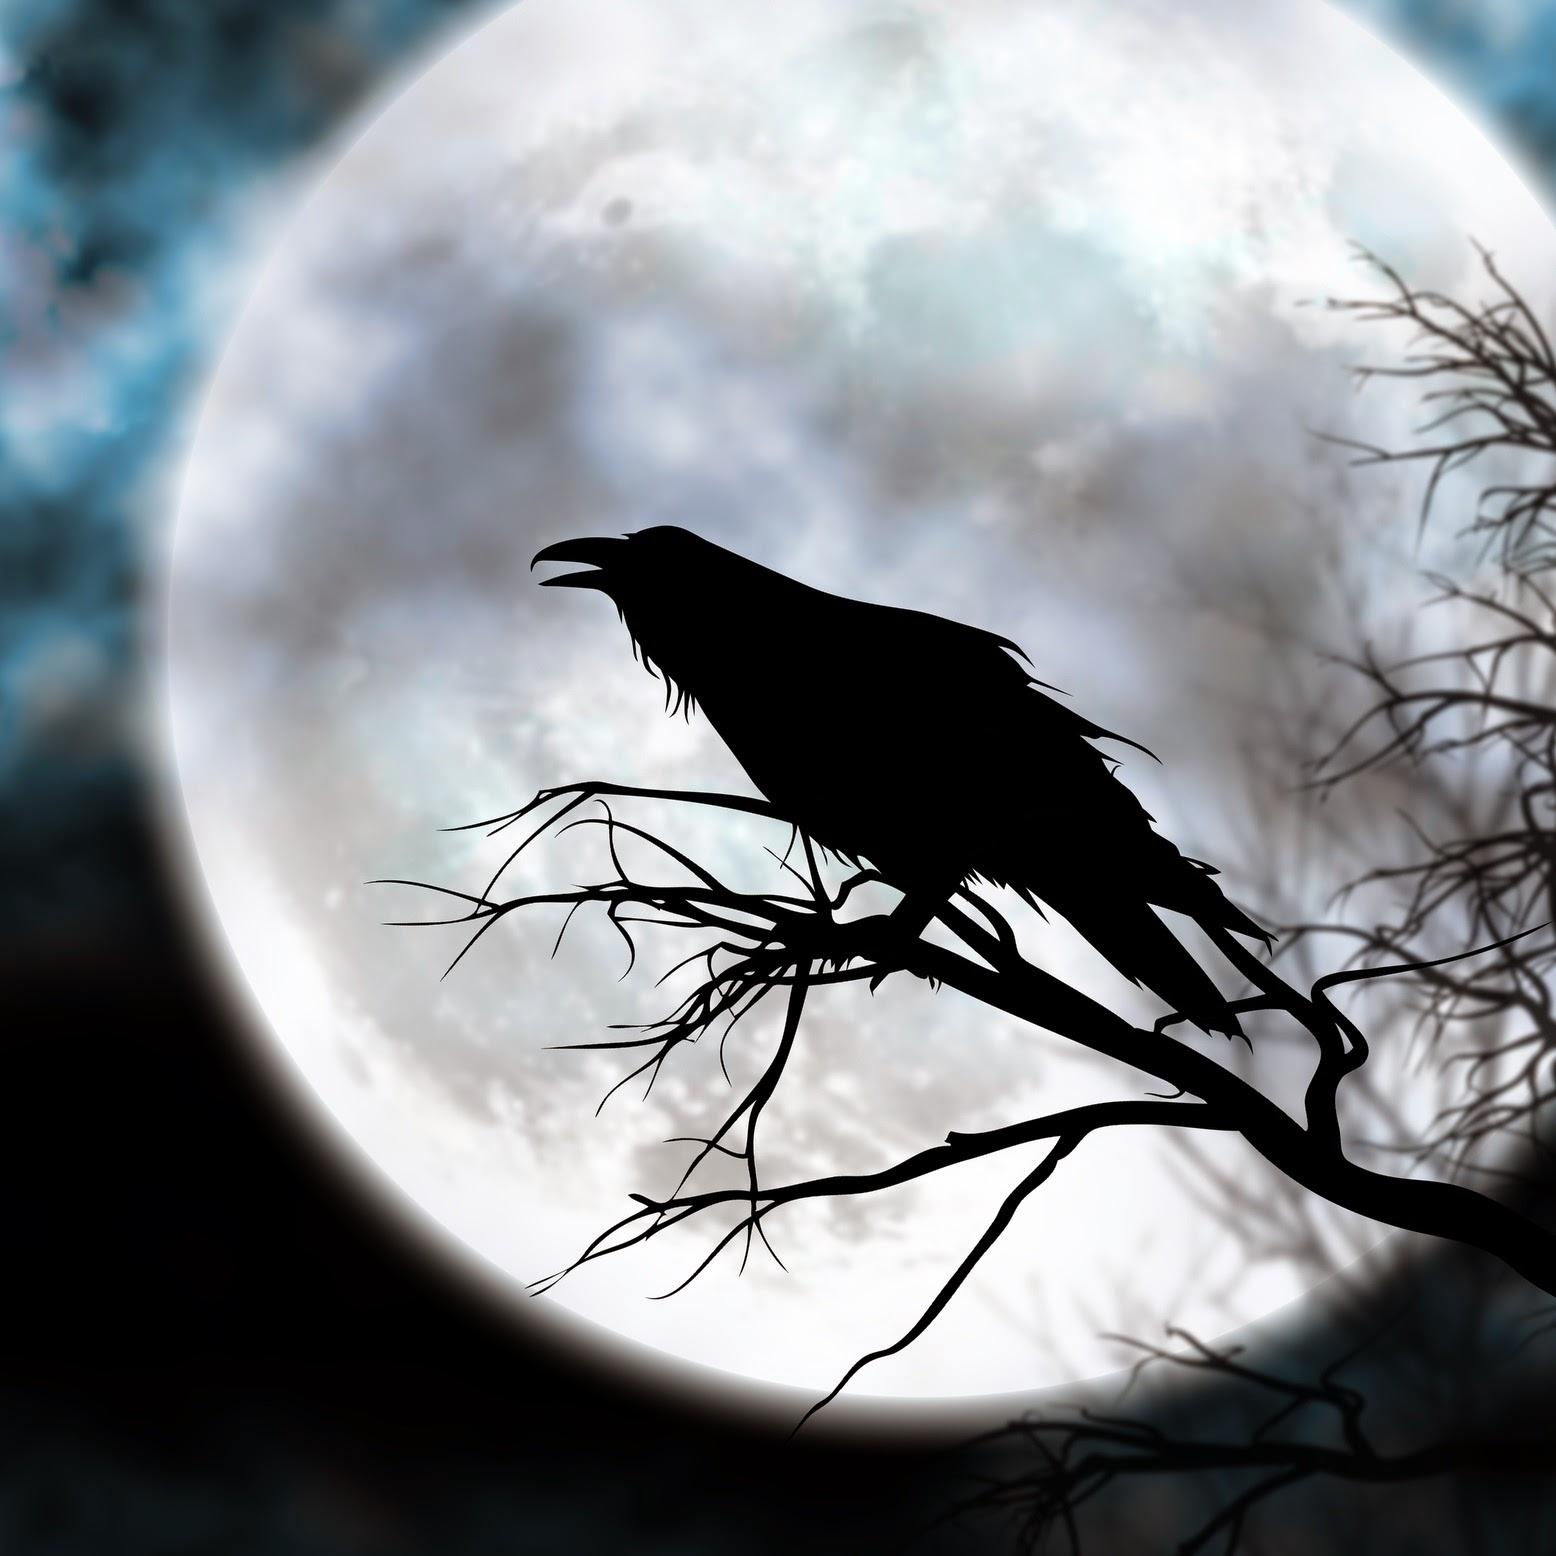 Edgar allan poe the raven analysis essay